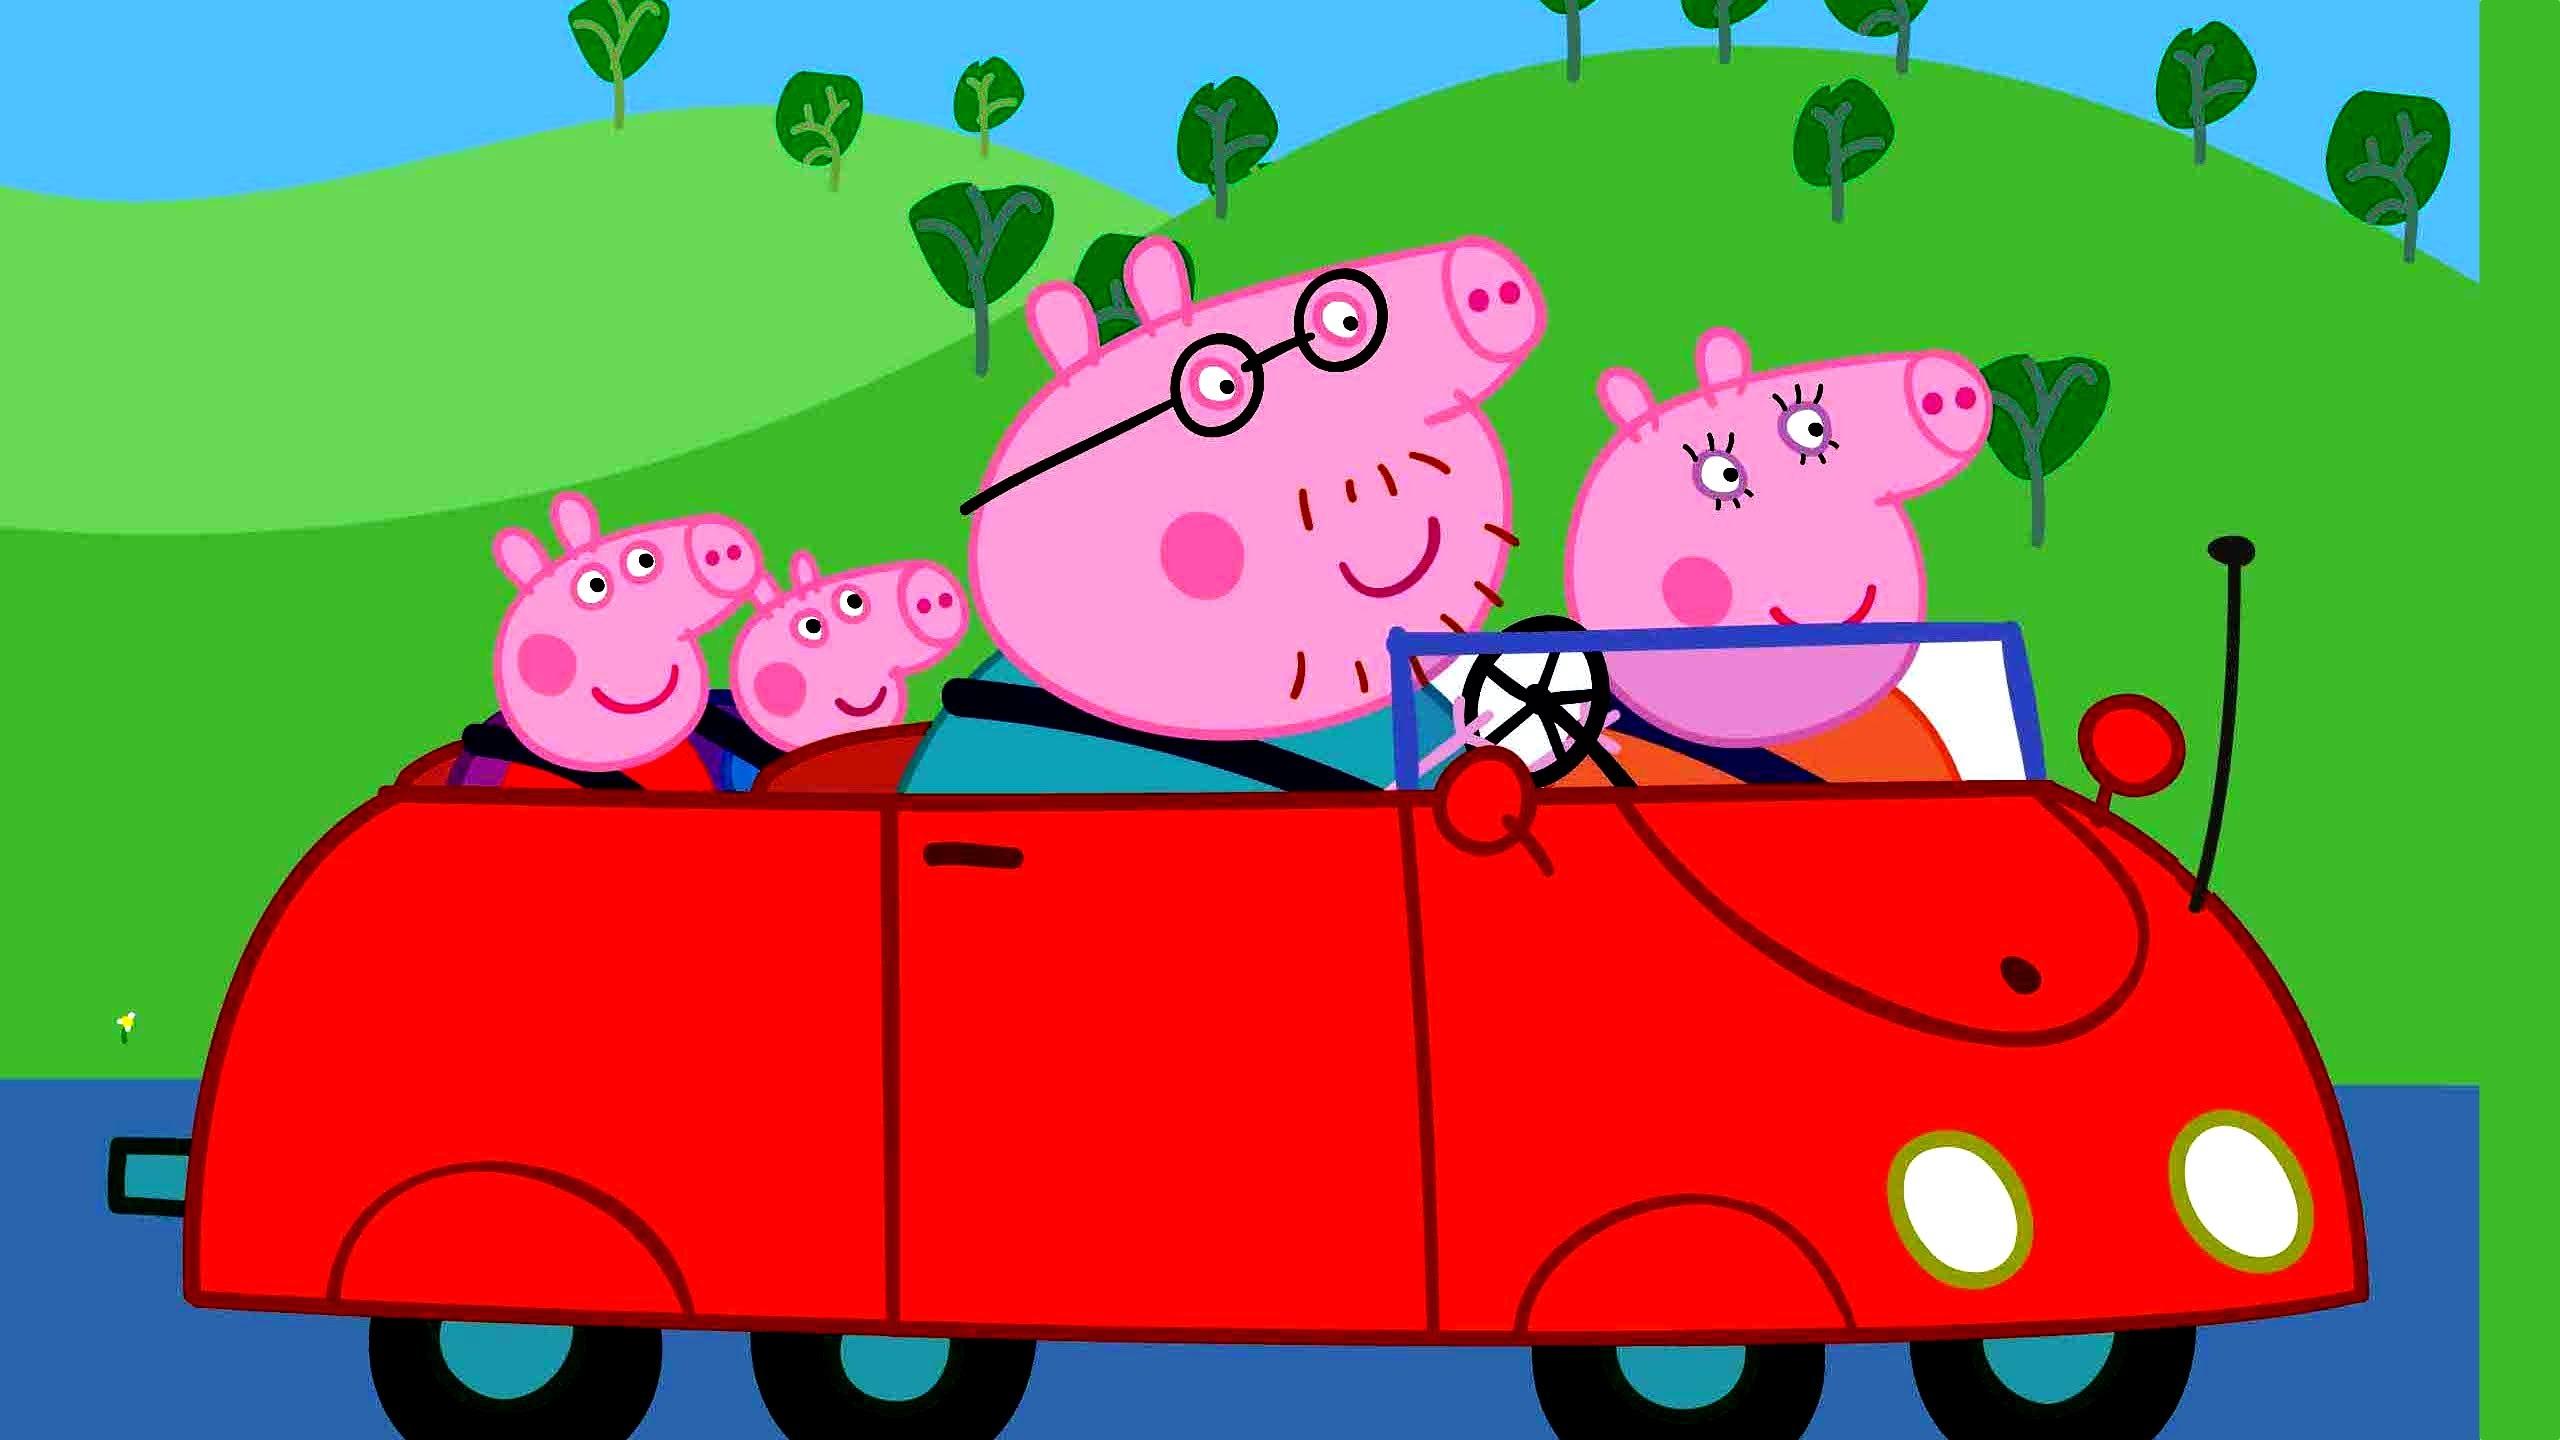 Fondos de pantalla de Peppa Pig para descargar